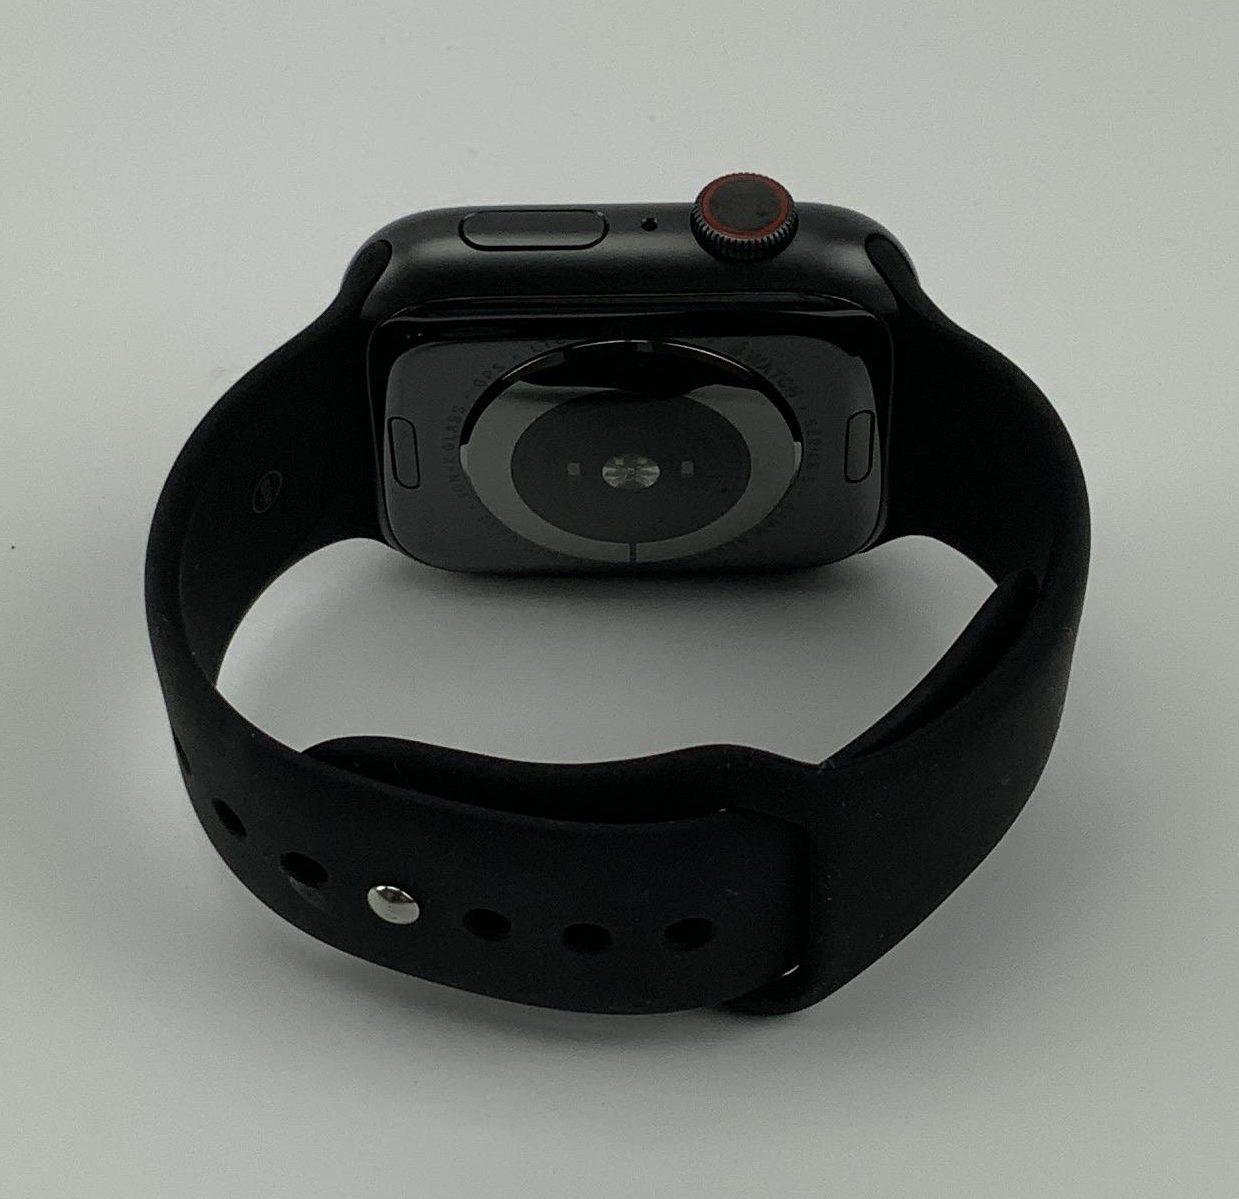 Watch Series 5 Aluminum Cellular (44mm), Space Gray, Bild 4